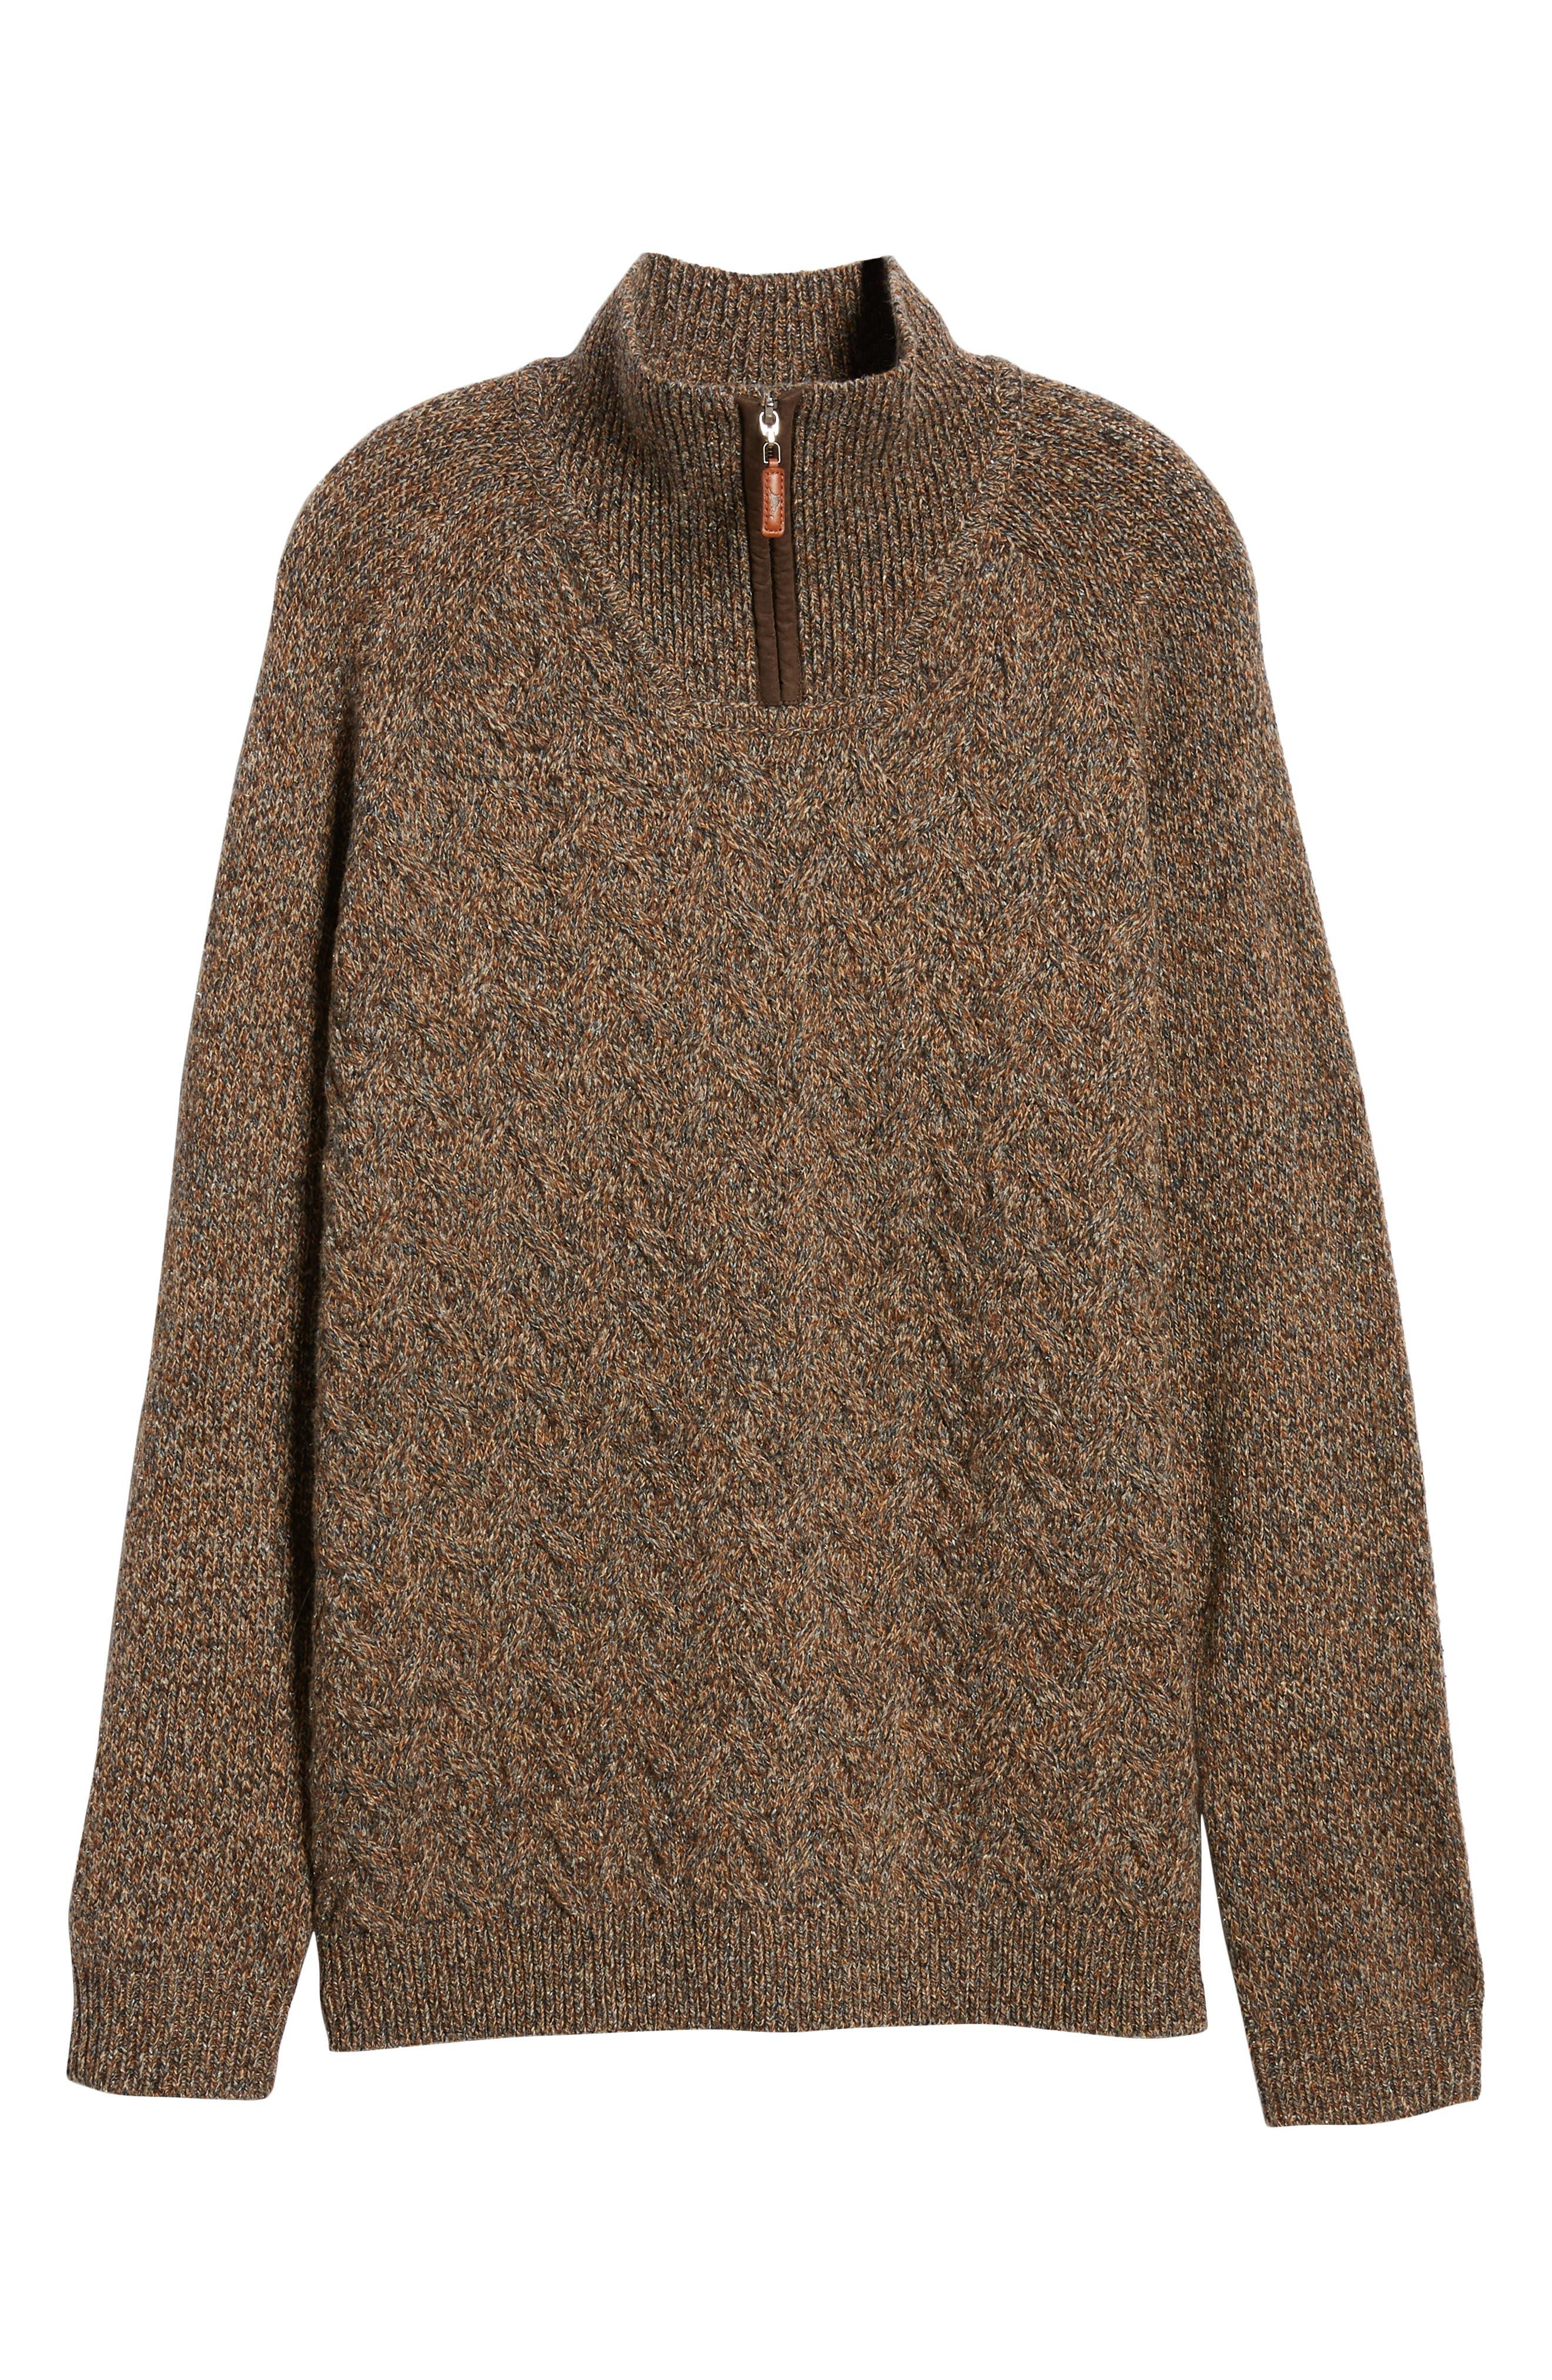 Irazu Half Zip Sweater,                             Alternate thumbnail 6, color,                             201